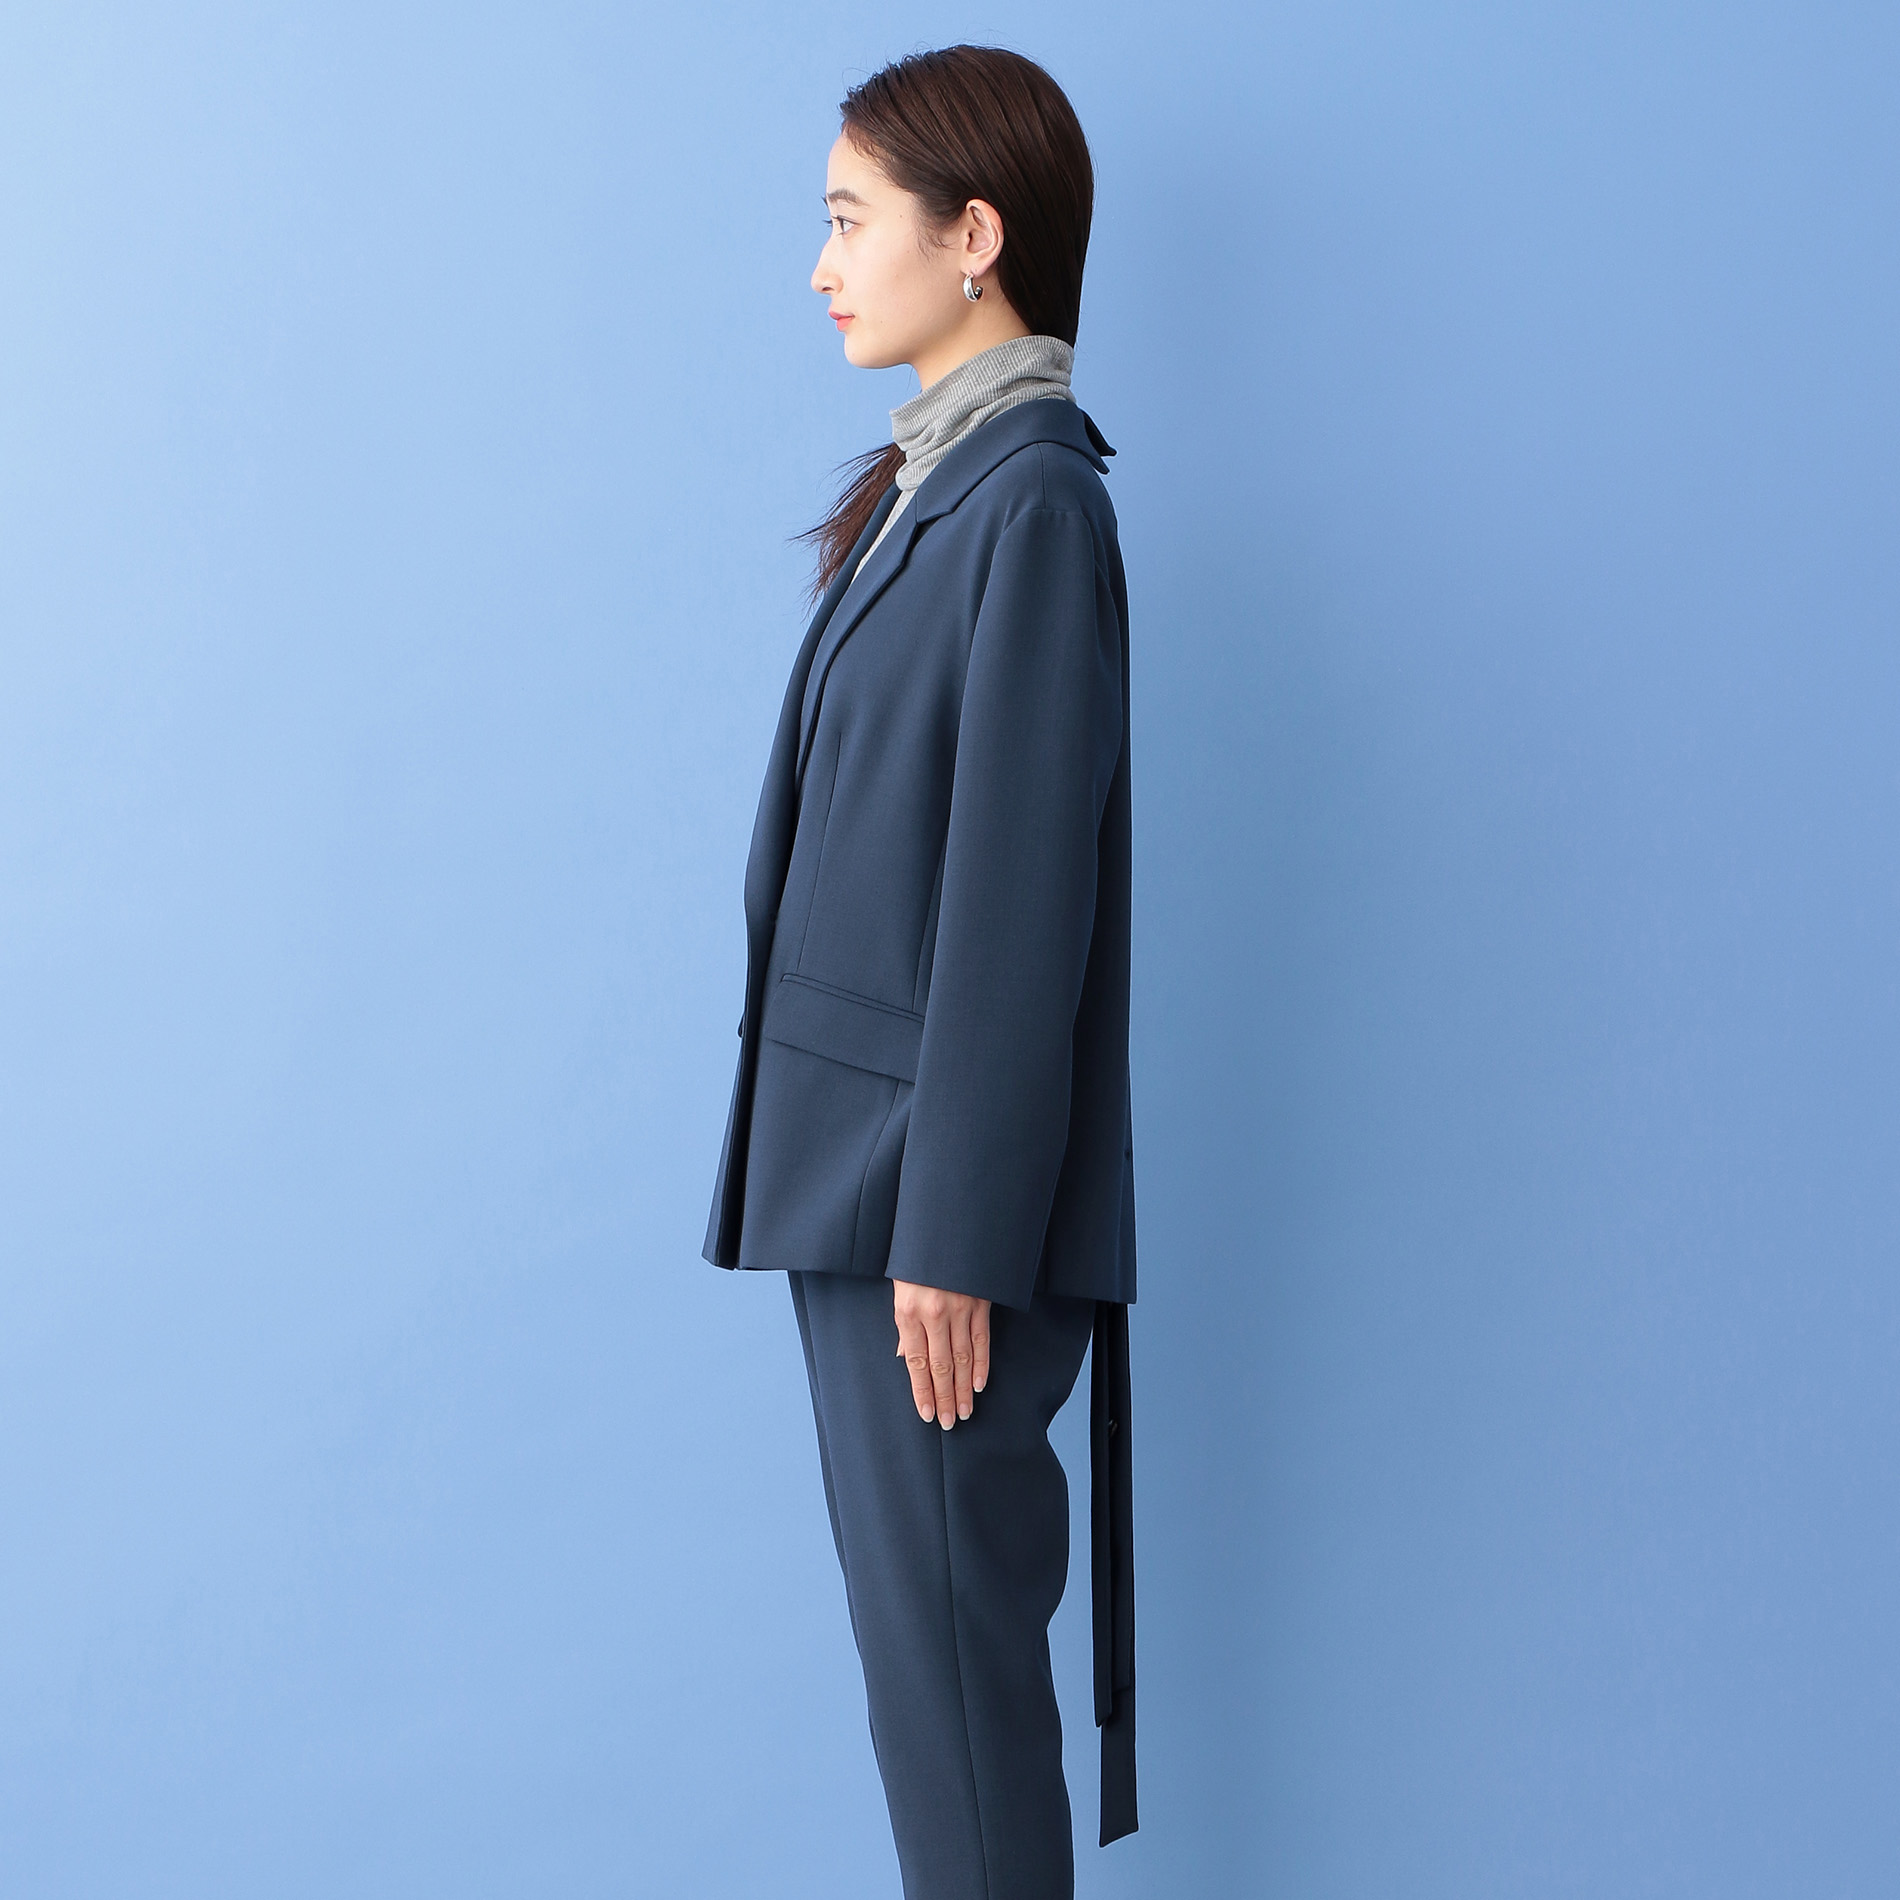 【Oggi10月号掲載】【ショップで人気】ベルテッドコンビジャケット【セットアップ】